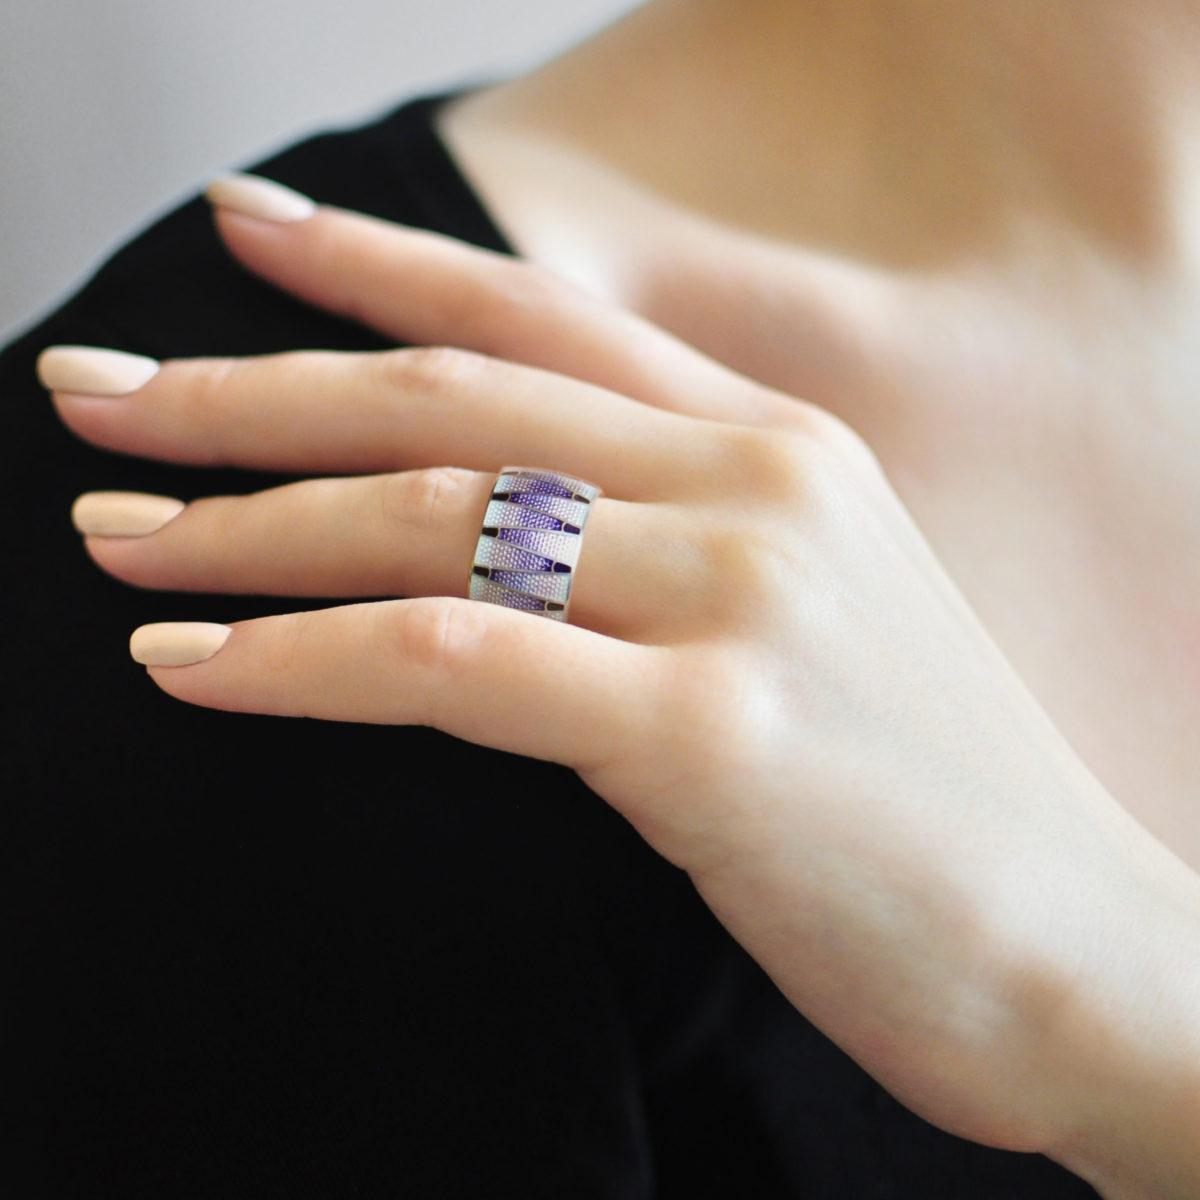 Serebro fioletovaya 9 1200x1200 - Кольцо из серебра «Тамтам», фиолетовая